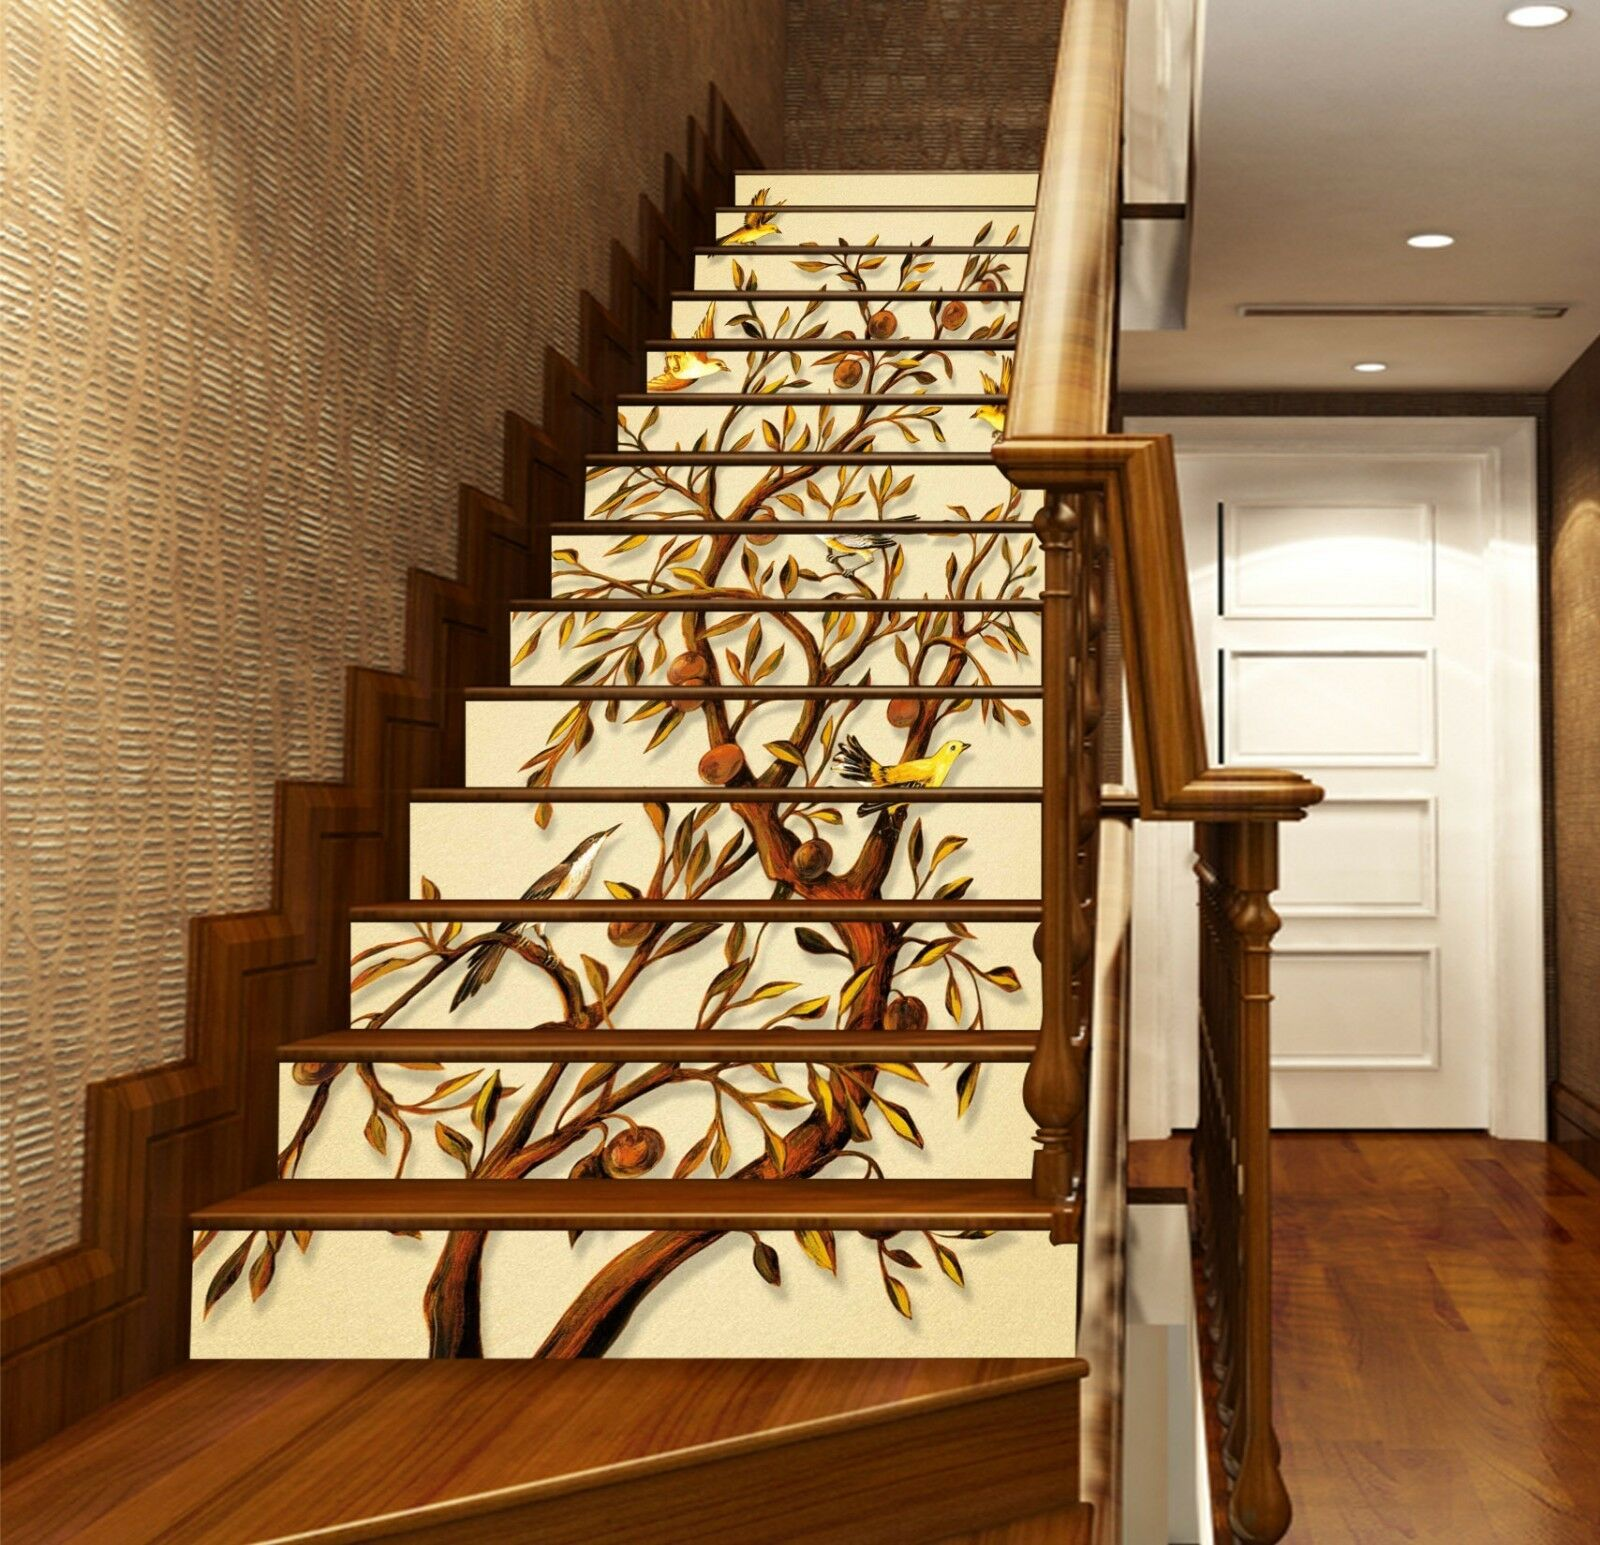 3D Painting Tree Stair Risers Decoration Photo Mural Vinyl Decal WandPapier UK